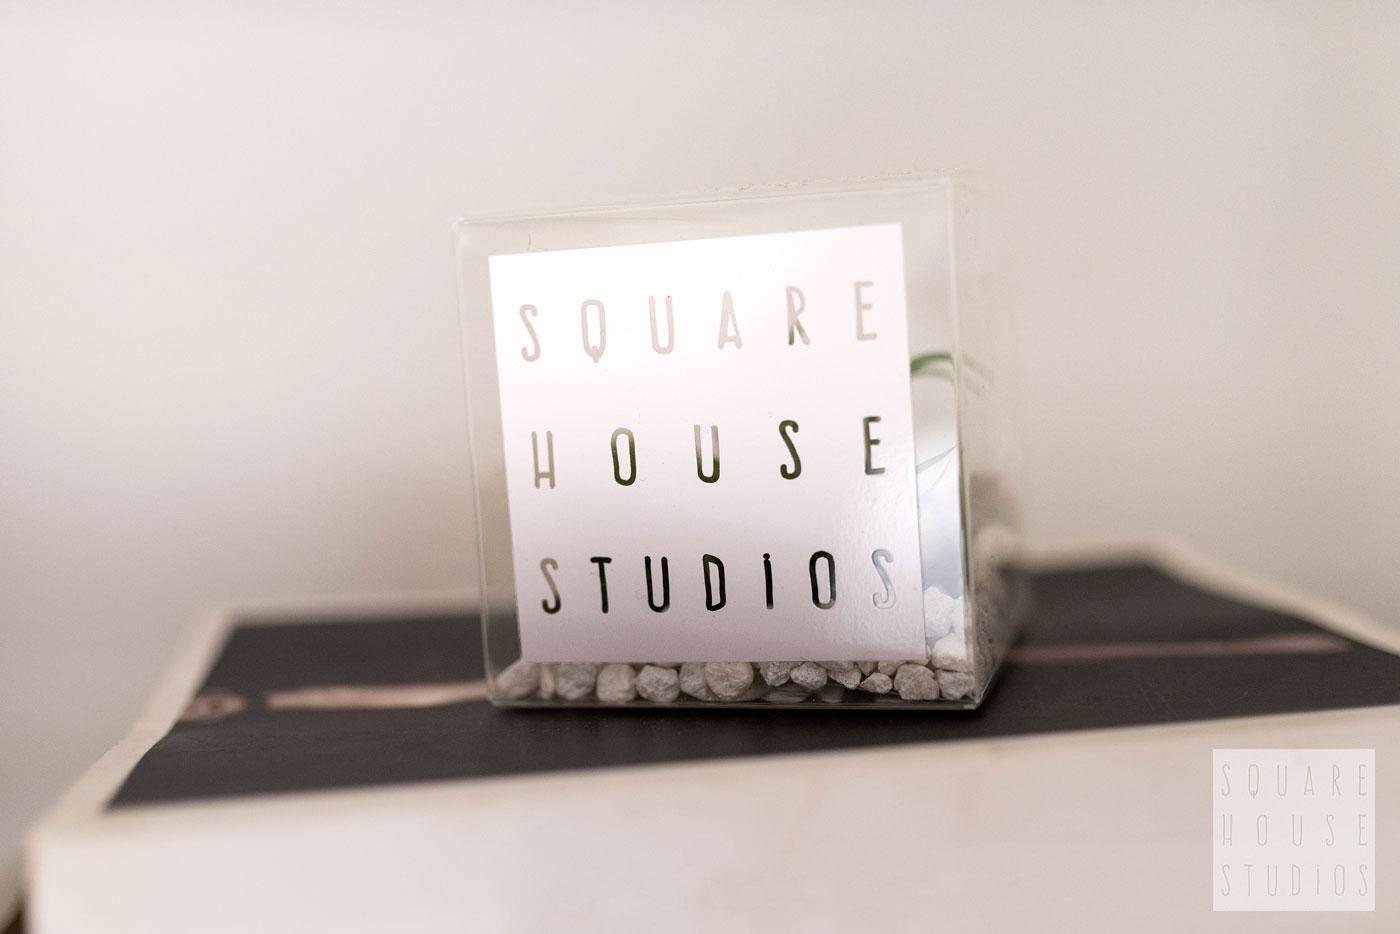 squarehouse-studios-Detail-Cube-on-Books.jpg